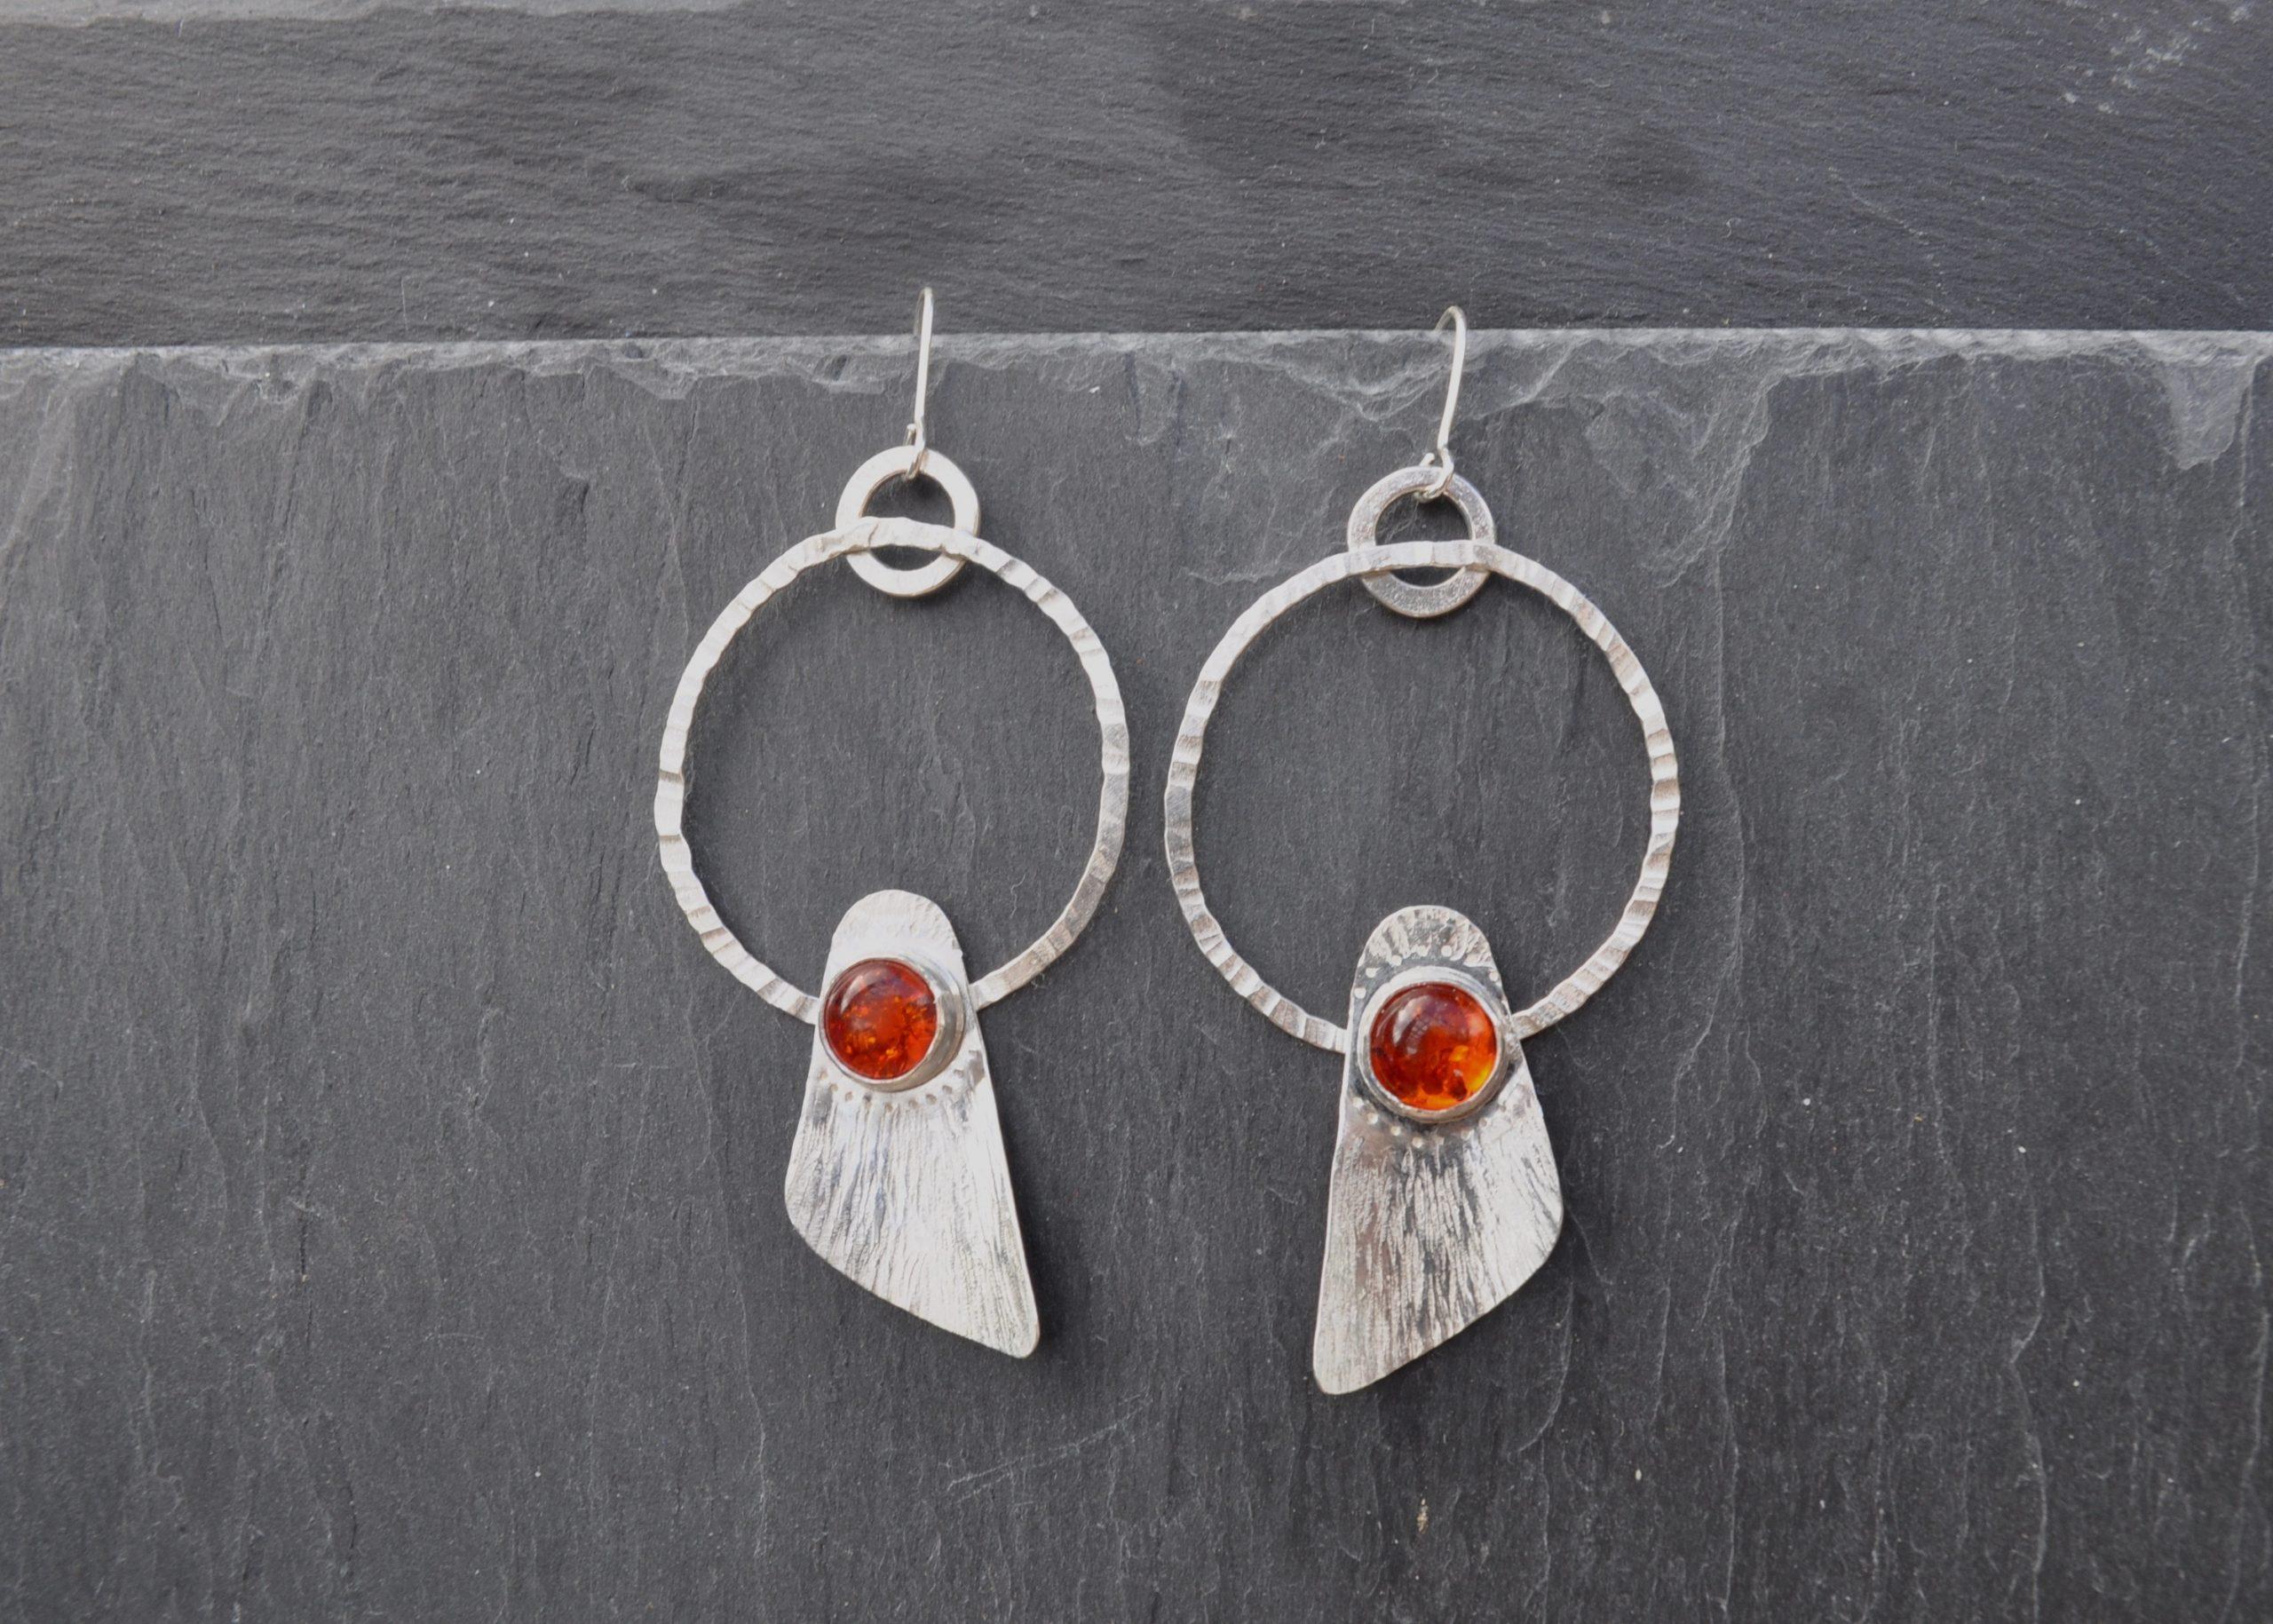 Amber set in sterling silver, seed pod inspired earrings.